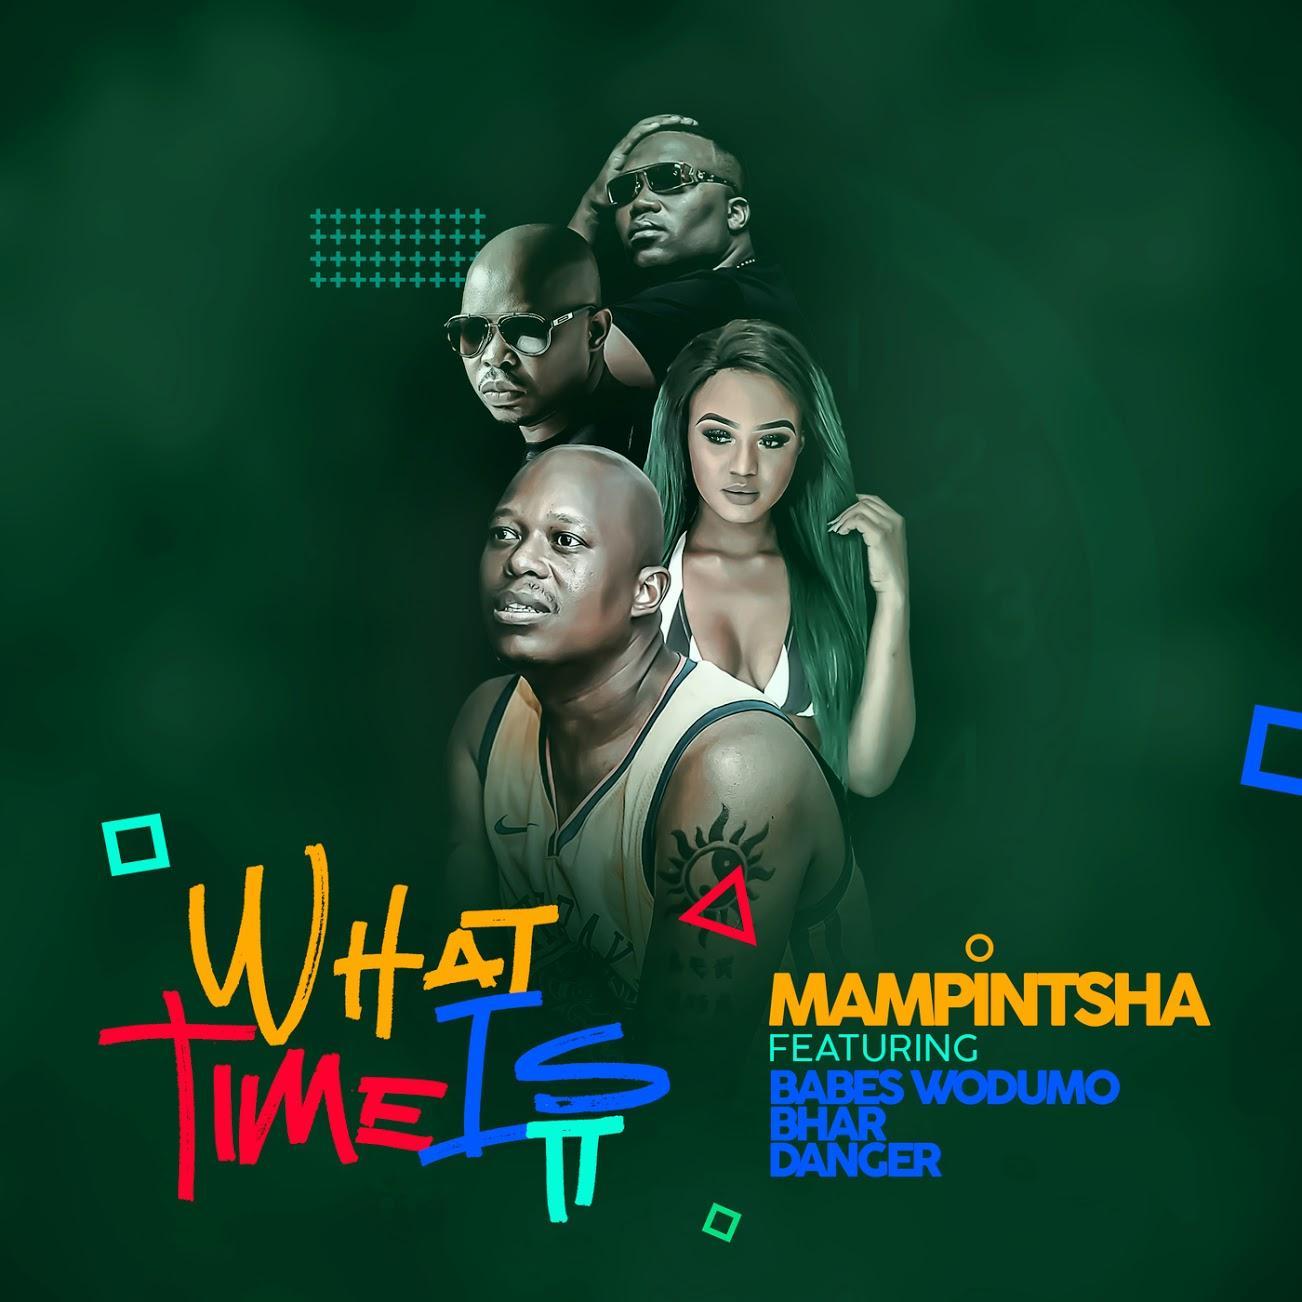 Mampintsha ft Babes Wodumo, Bhar & Danger - What Time Is It